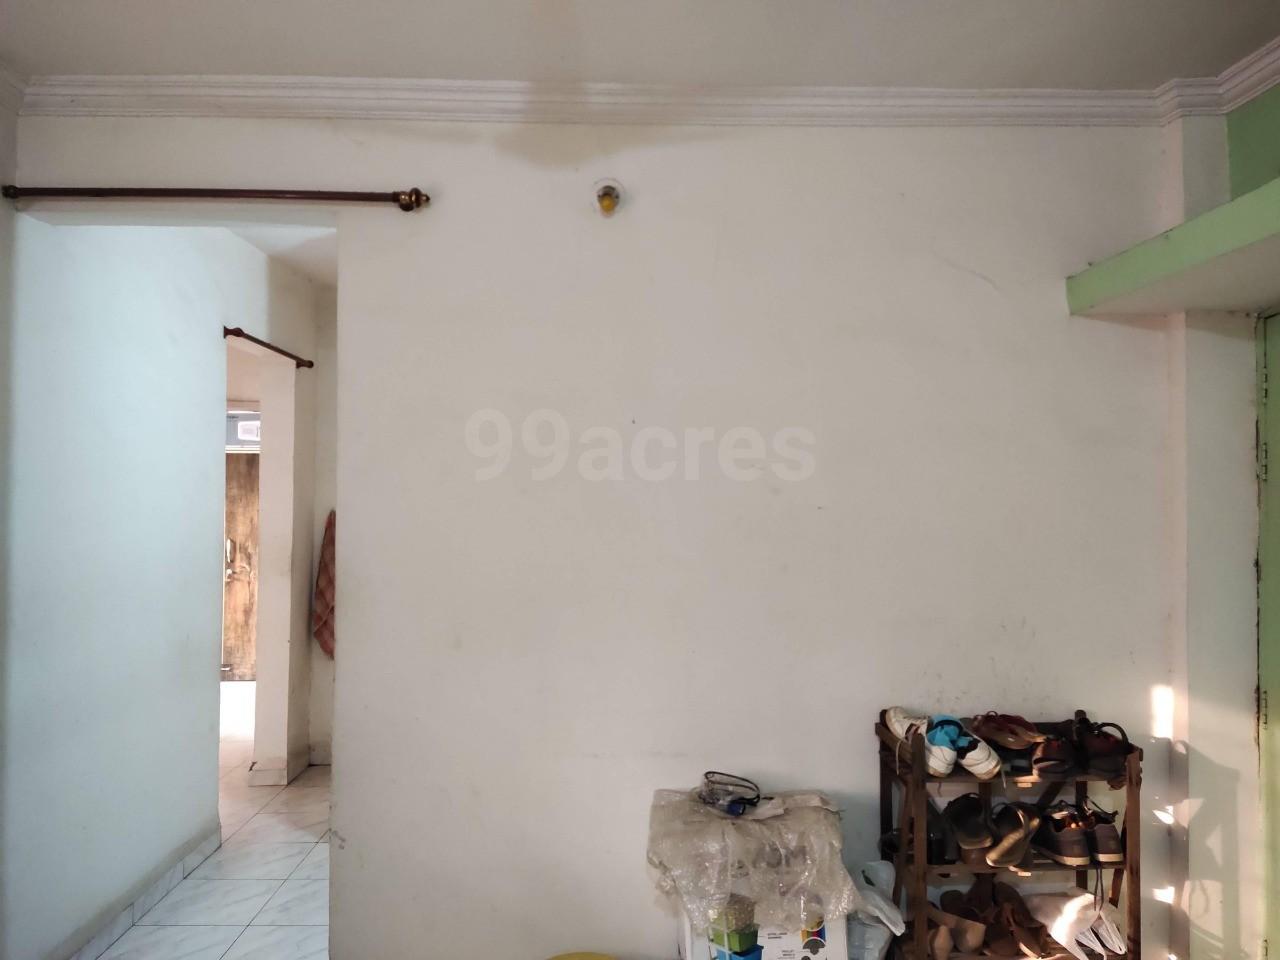 https://s3.ap-south-1.amazonaws.com/fmr.media.public/taajg-1616417585161-28373